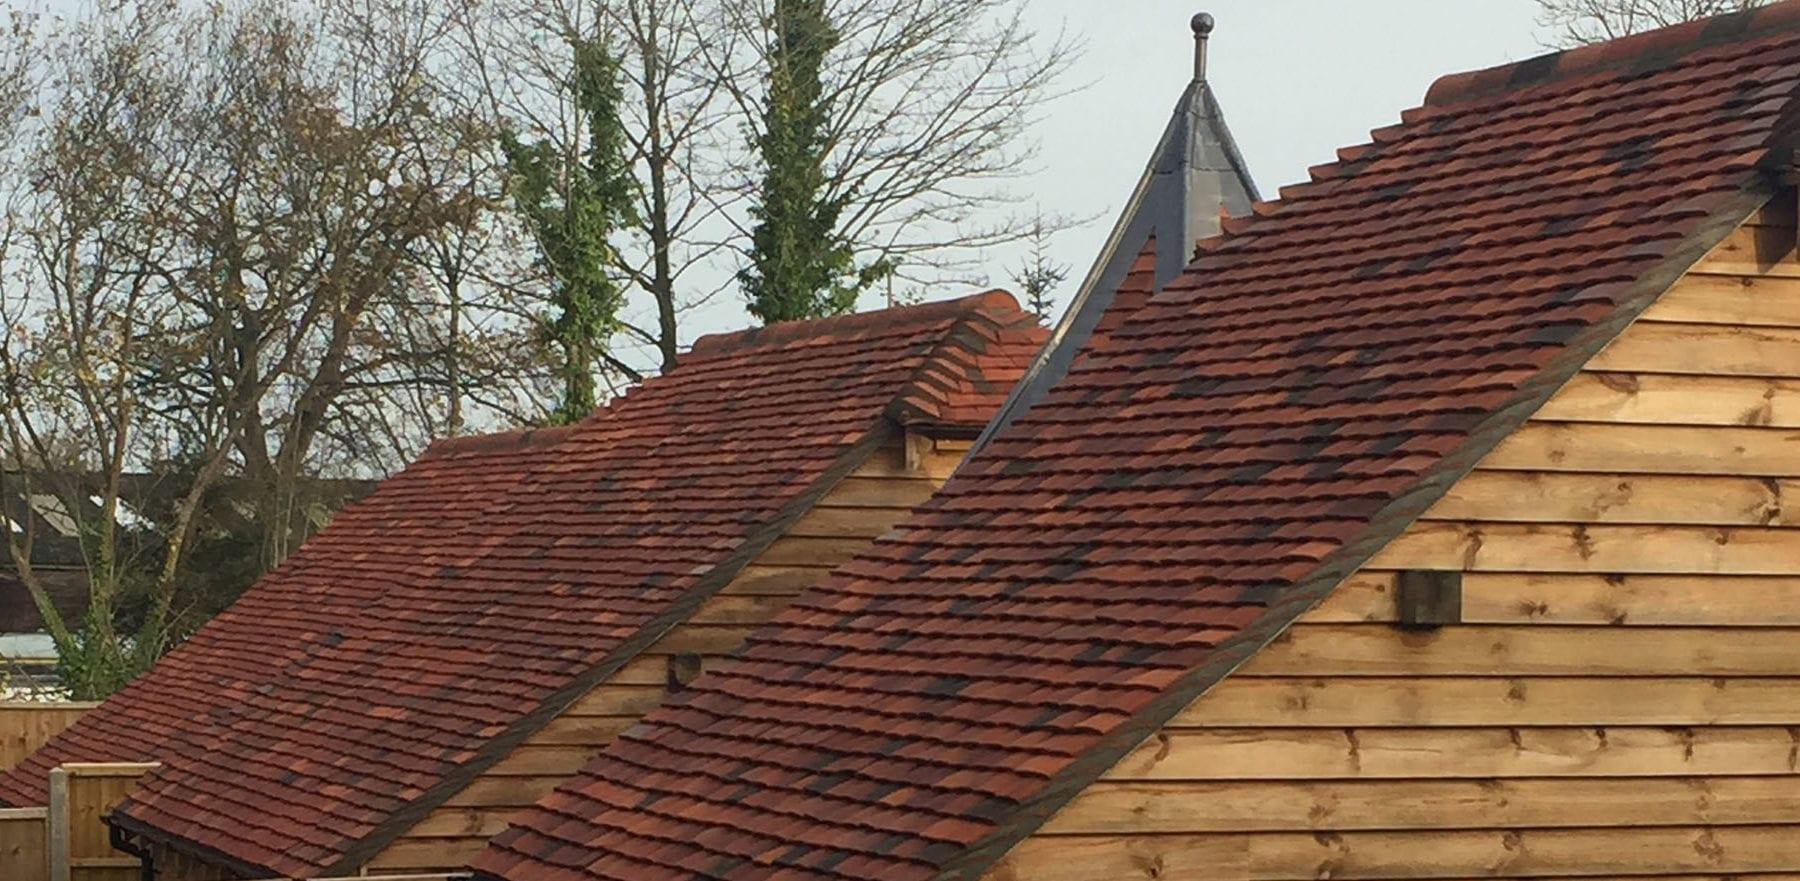 Lifestiles - Handmade Multi Clay Roof Tiles - Tenterden, England 4